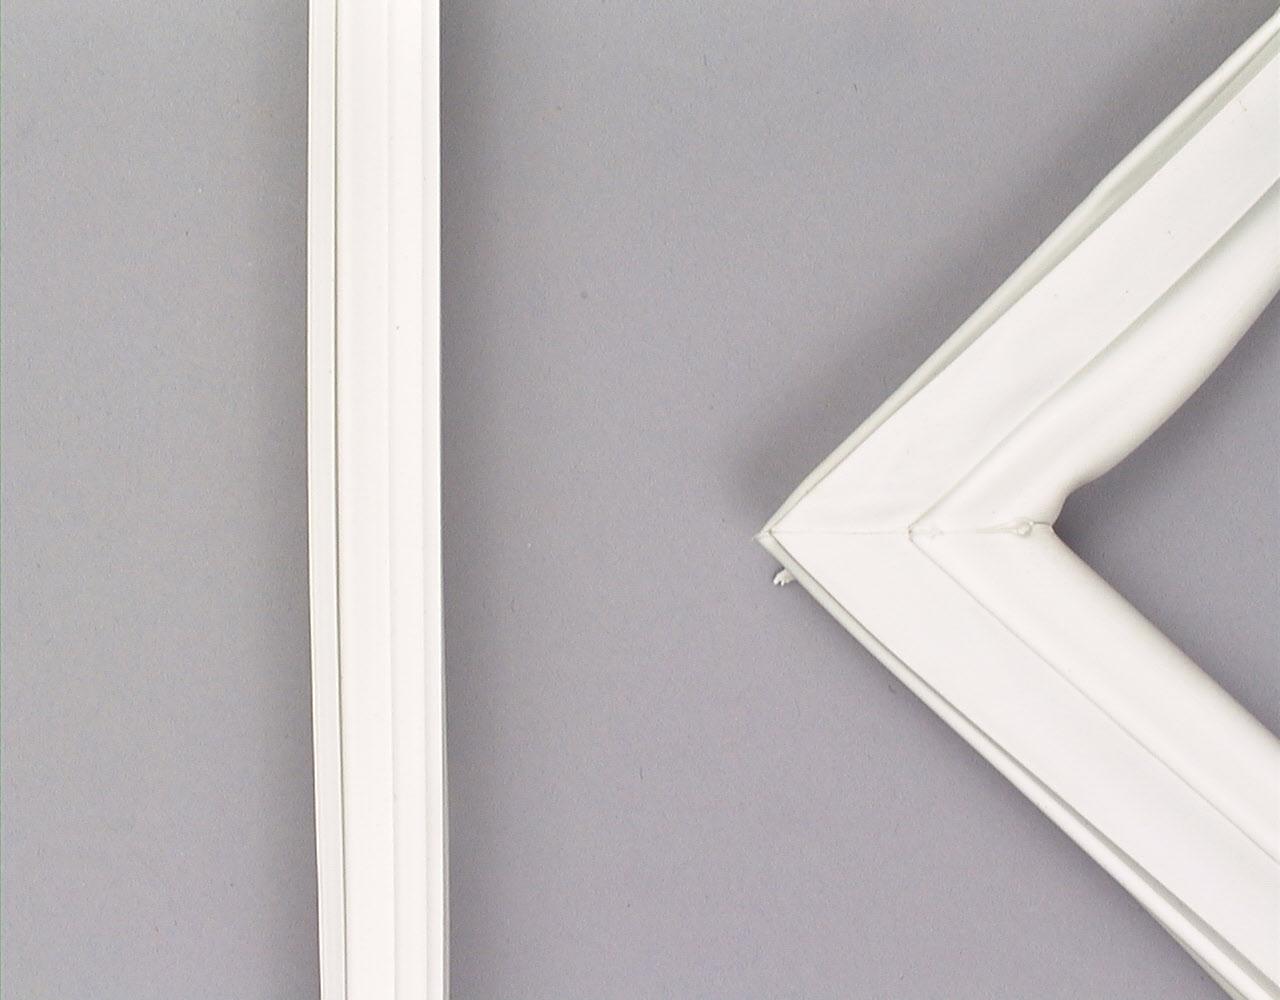 Westinghouse Refrigerator Part # 2188433A - Door Gasket